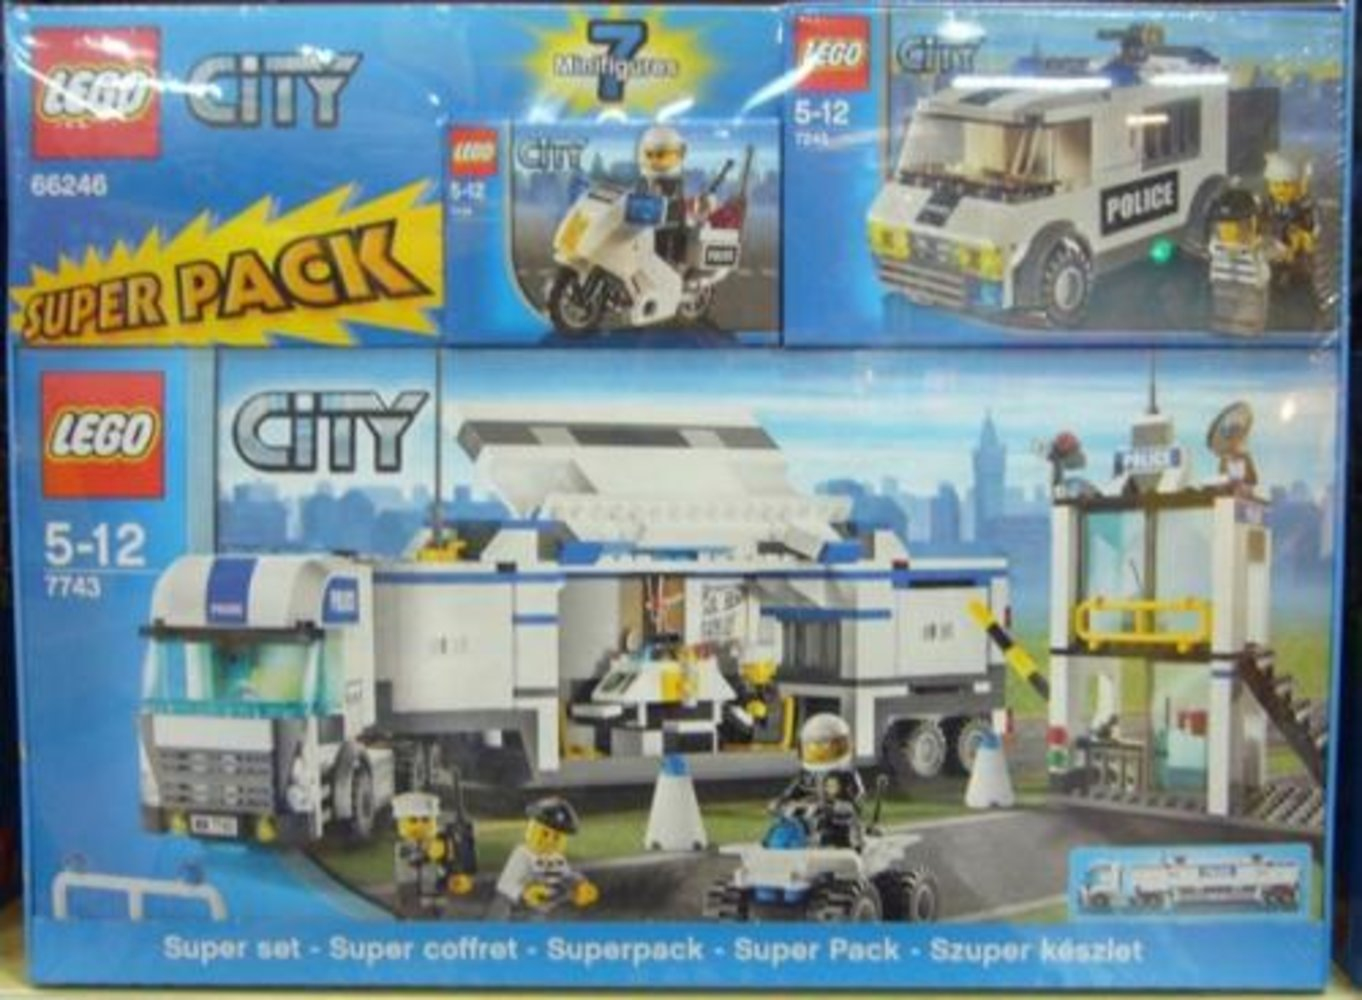 City Super Pack (7235 7245 7743)